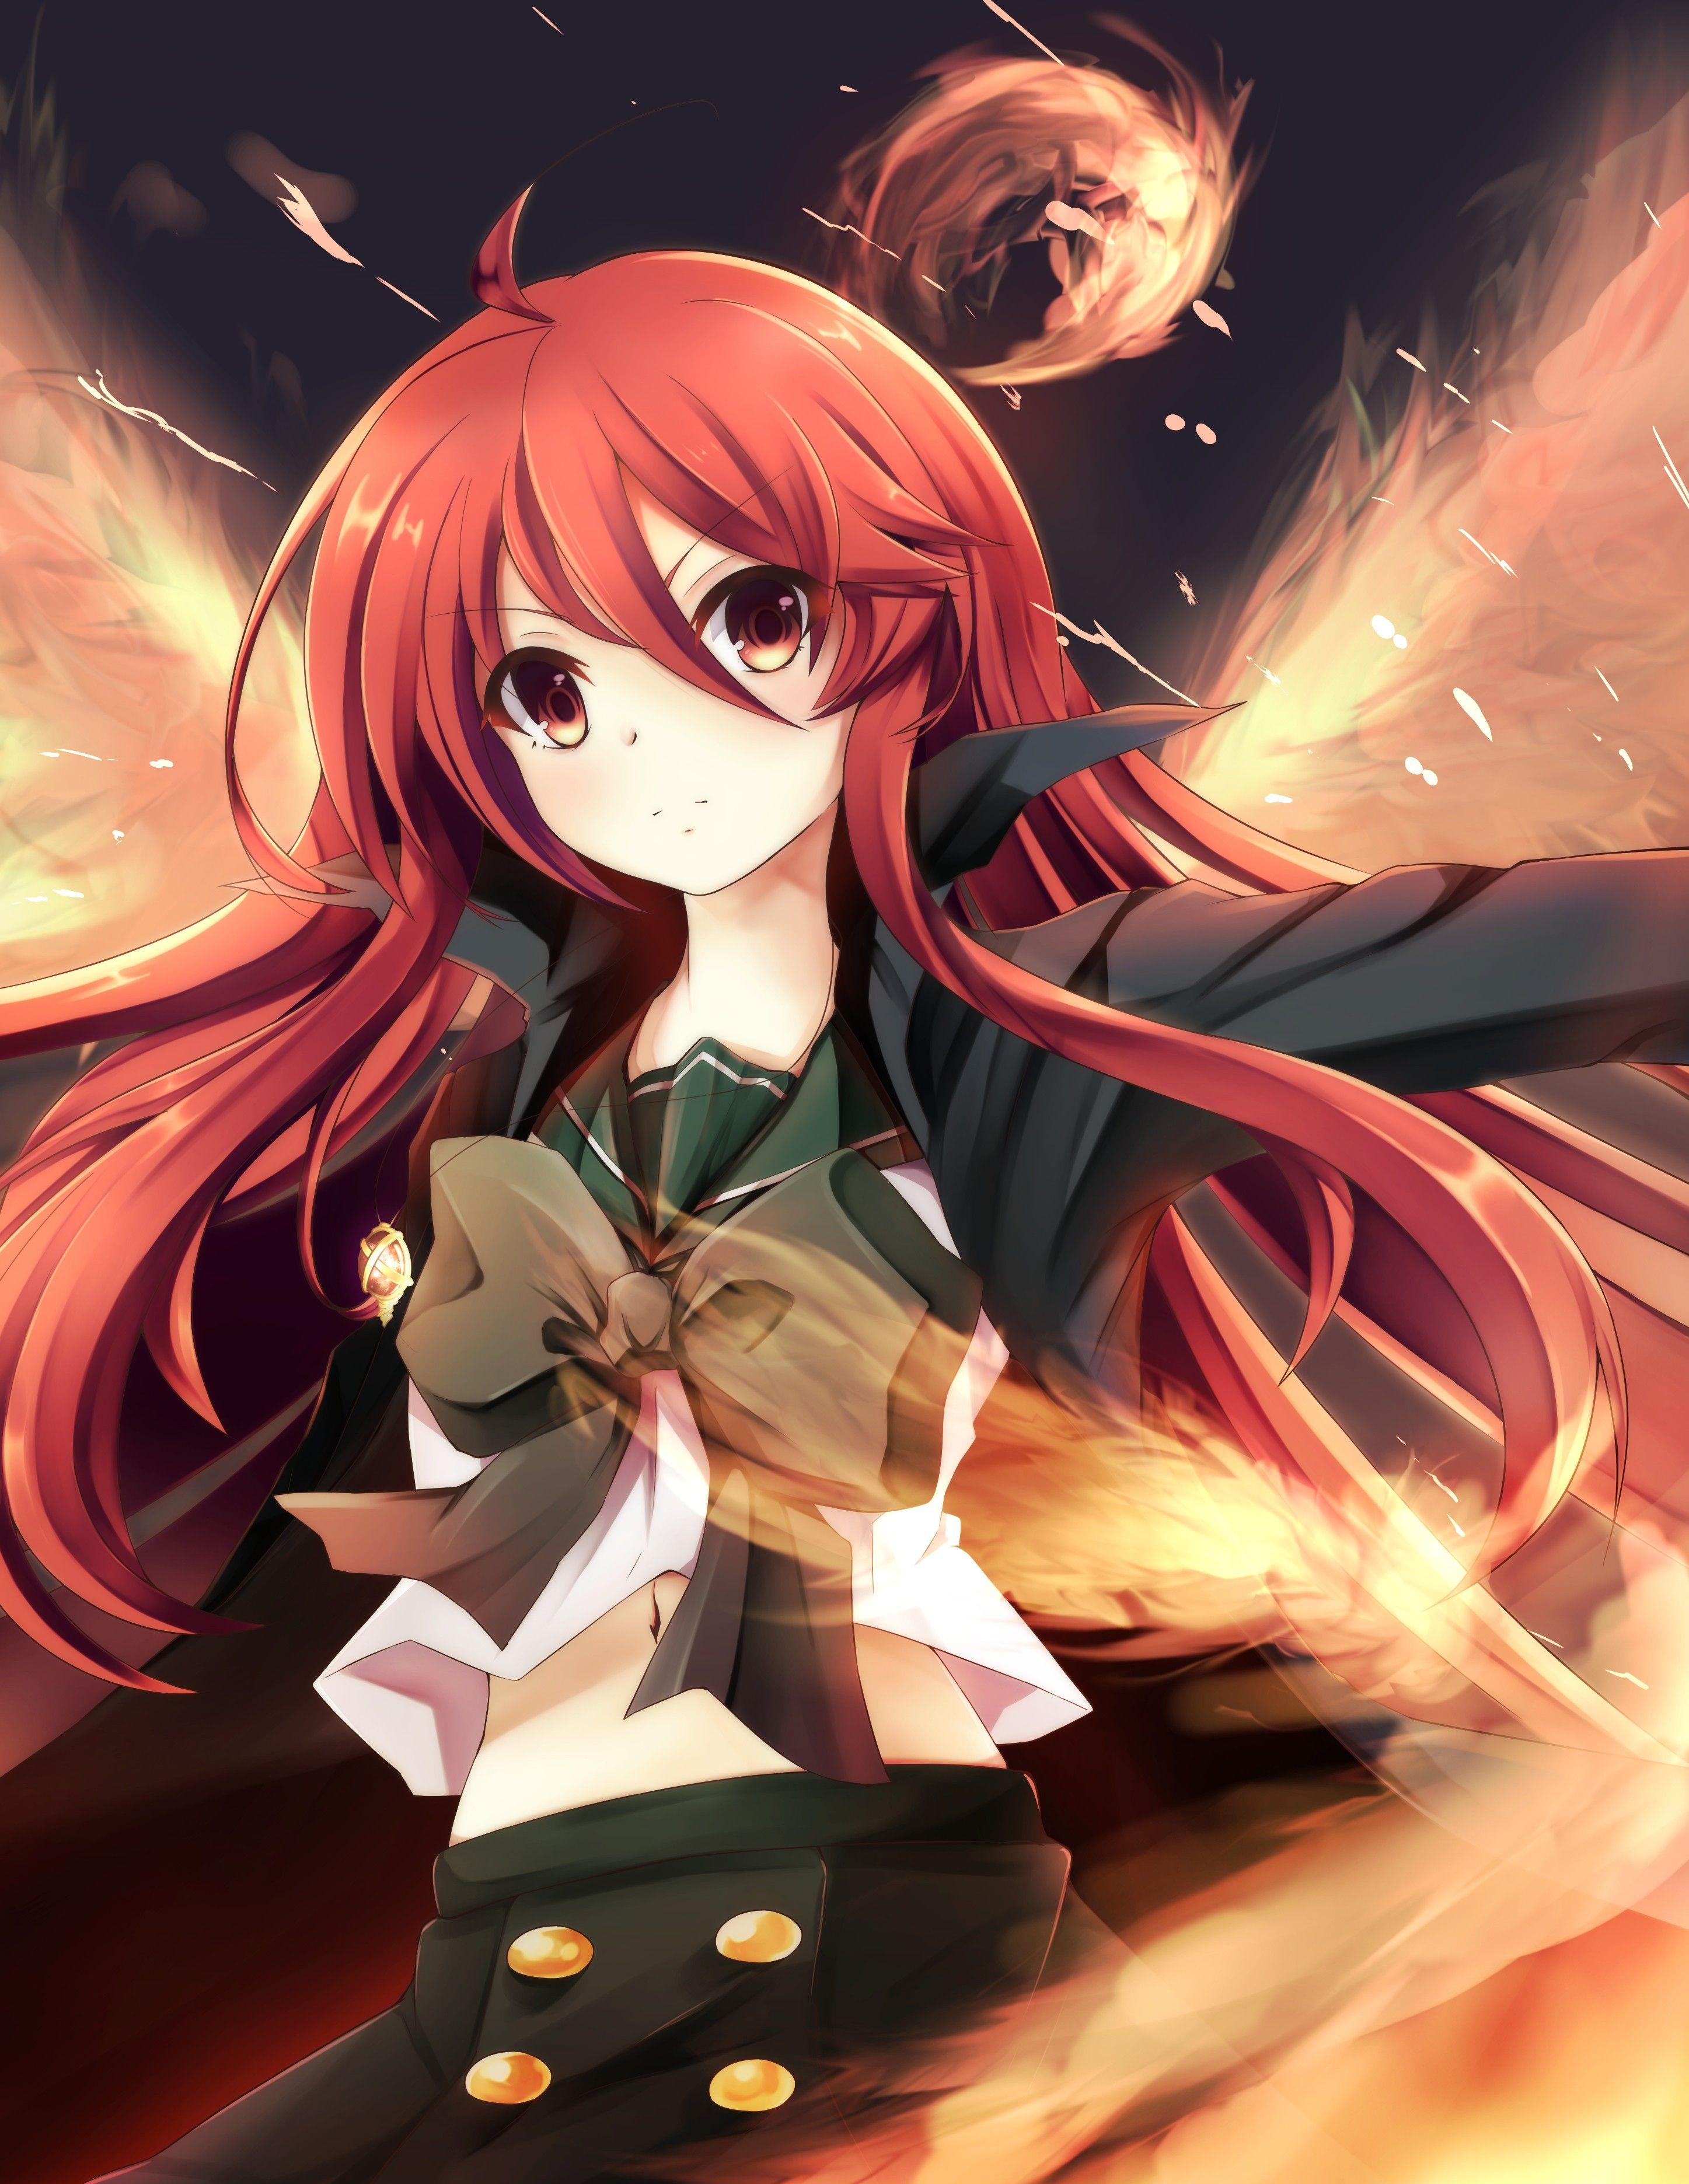 Shana shakugan no shana anime redhead red hair anime characters anime red